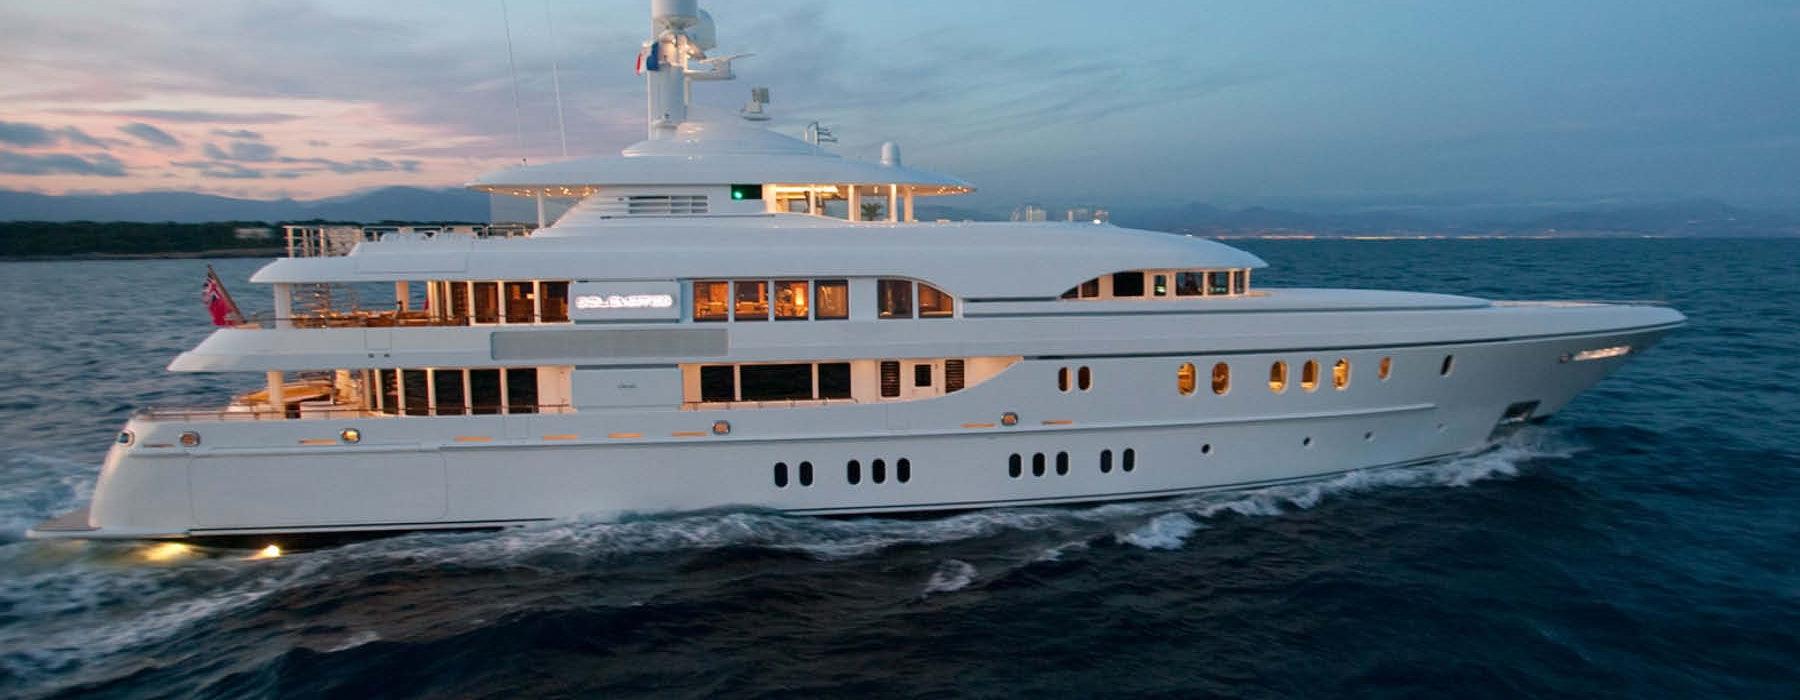 Lurssen SOLEMATES Built by Moran Yacht & Ship